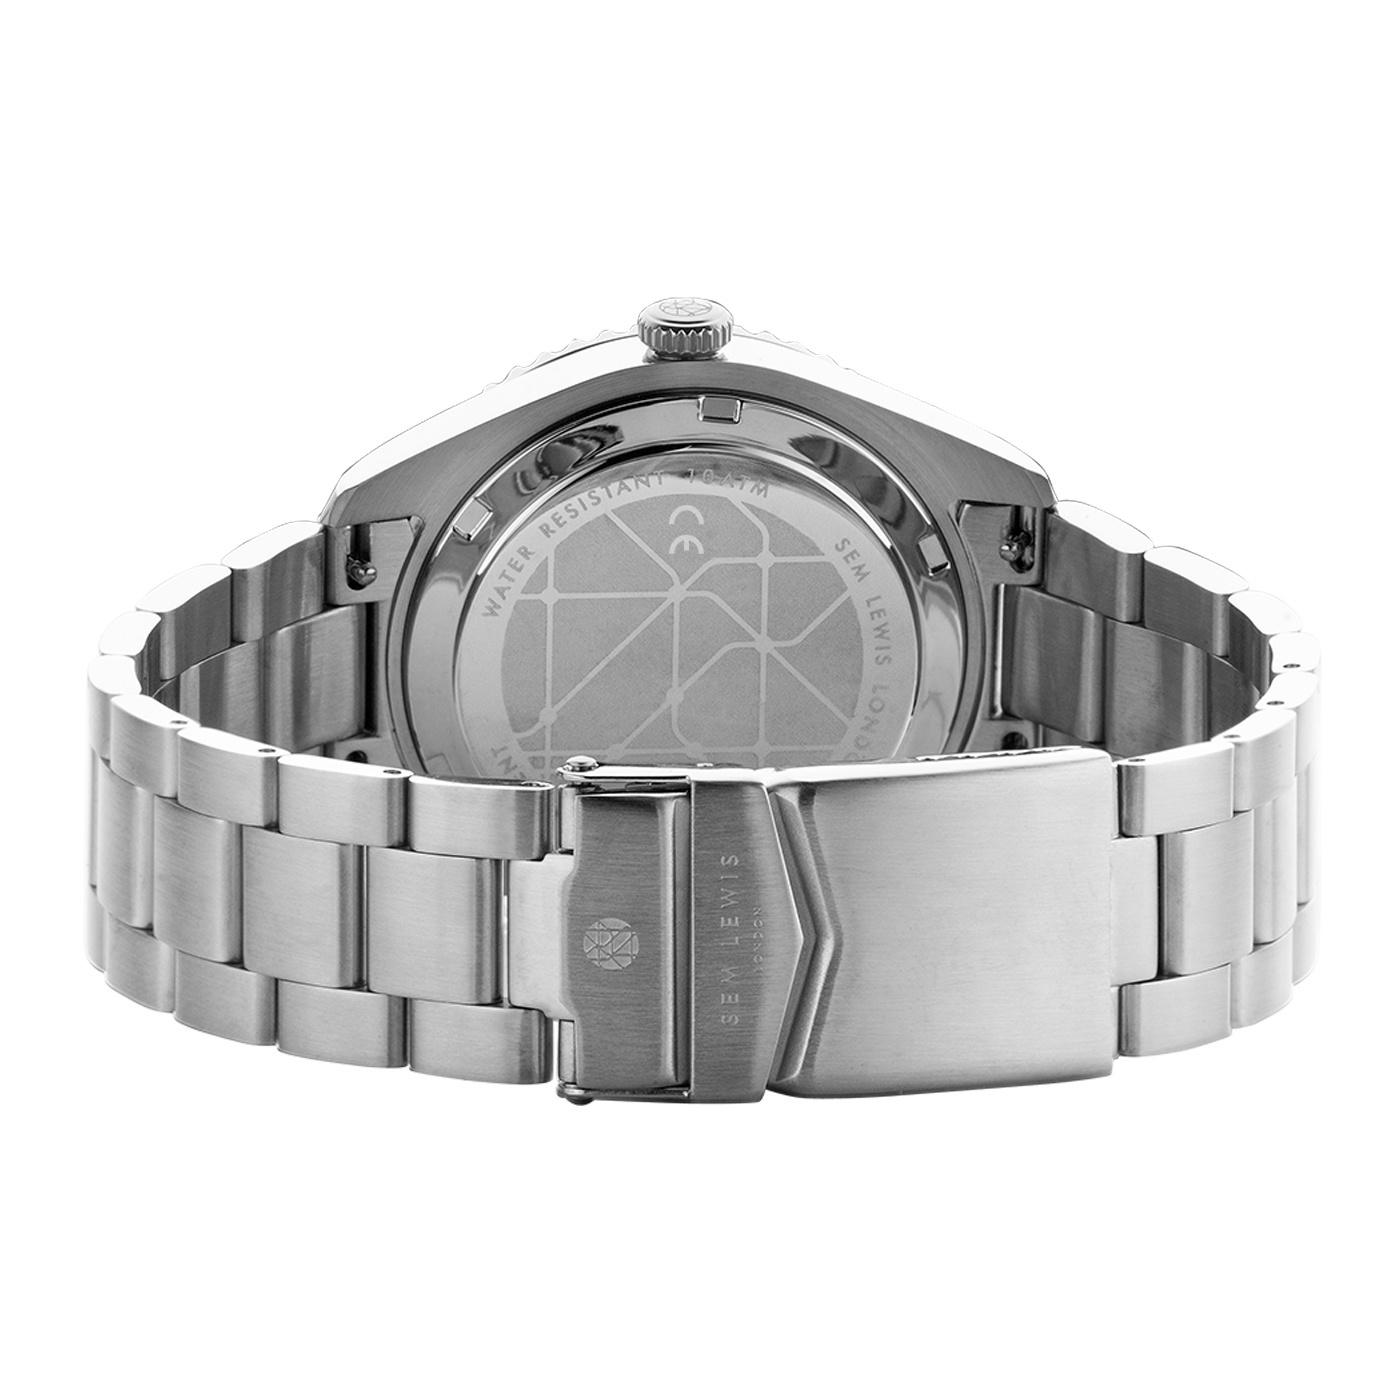 Sem Lewis Lundy Island Diver orologi color argento e verde